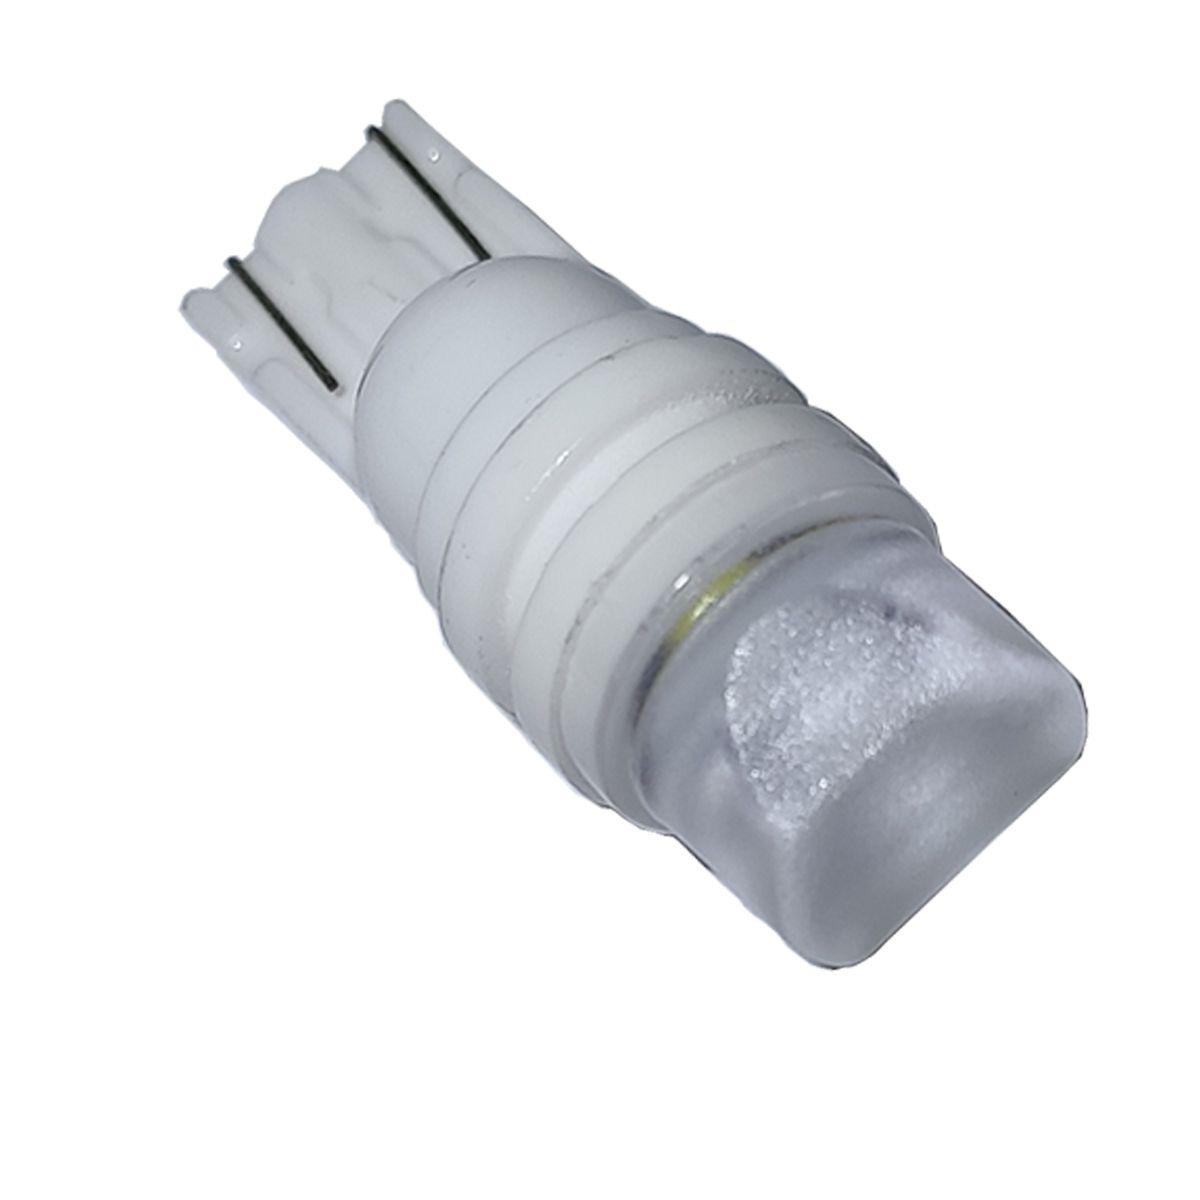 Lâmpada LED T10 3 CREE C/ Lente Pingo W5W Kit C/ 10